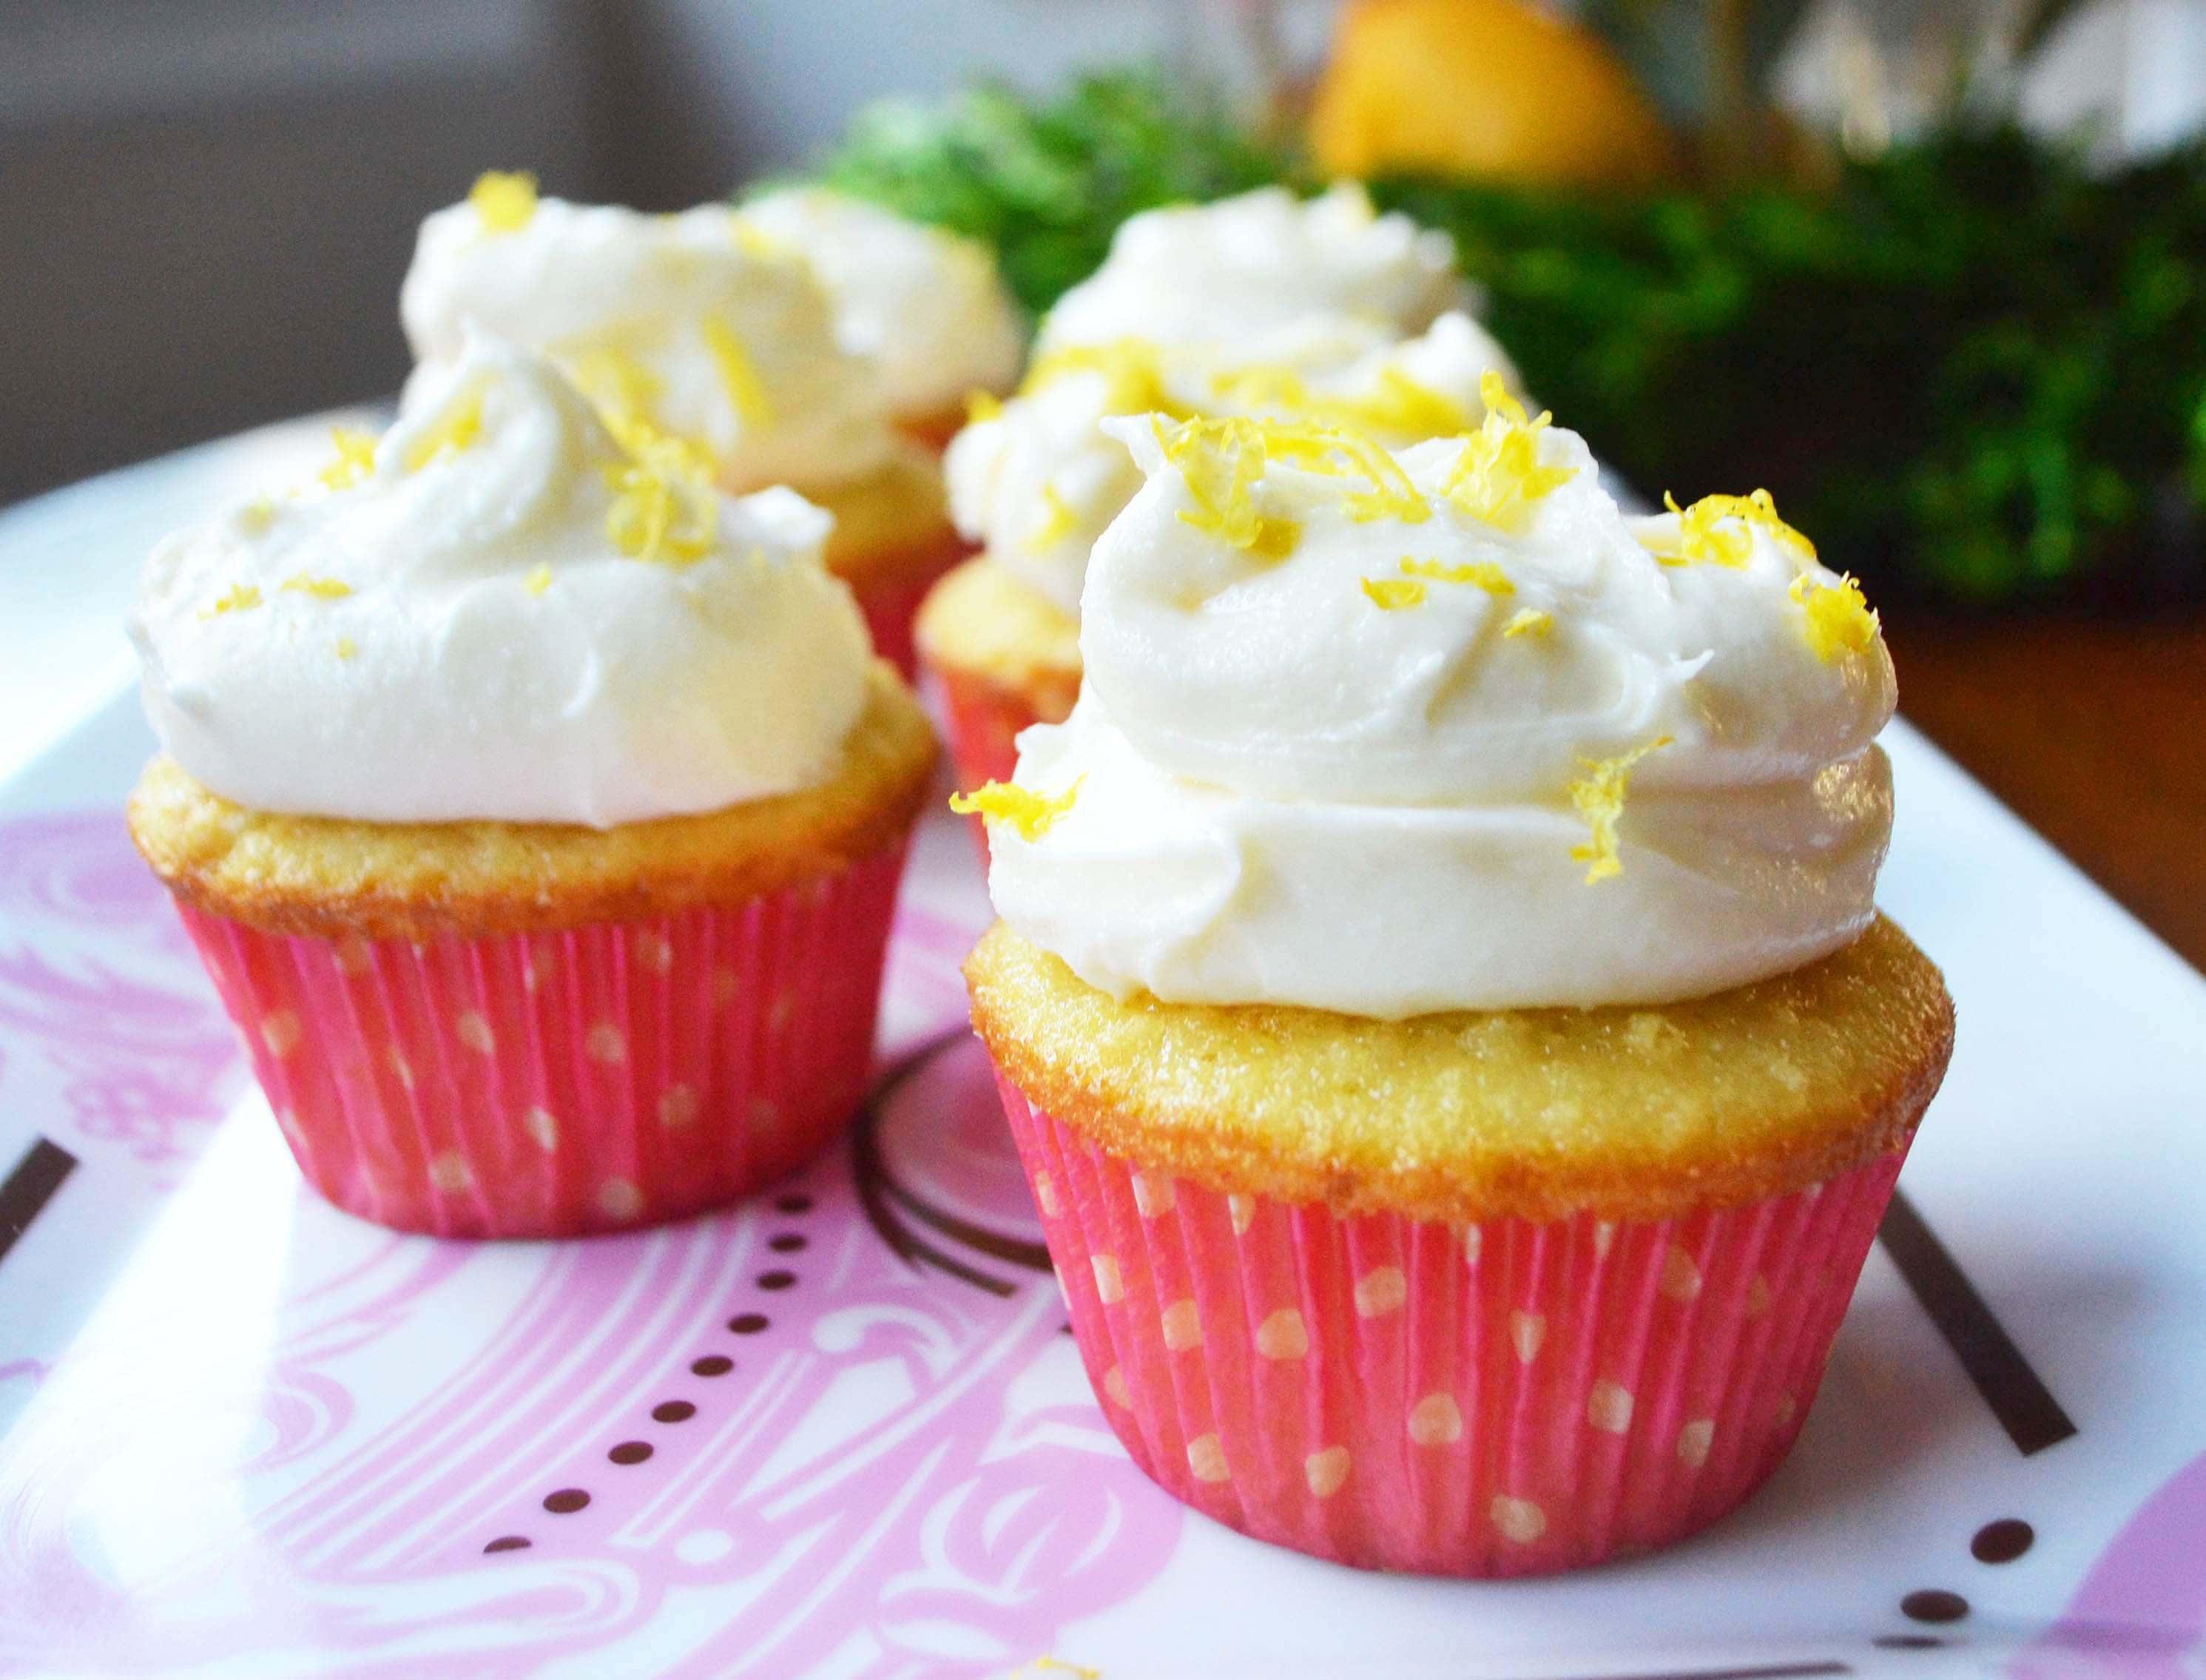 Italian Lemon Cupcakes with Sweet Ricotta Cream by Modern Honey - www.modernhoney.com